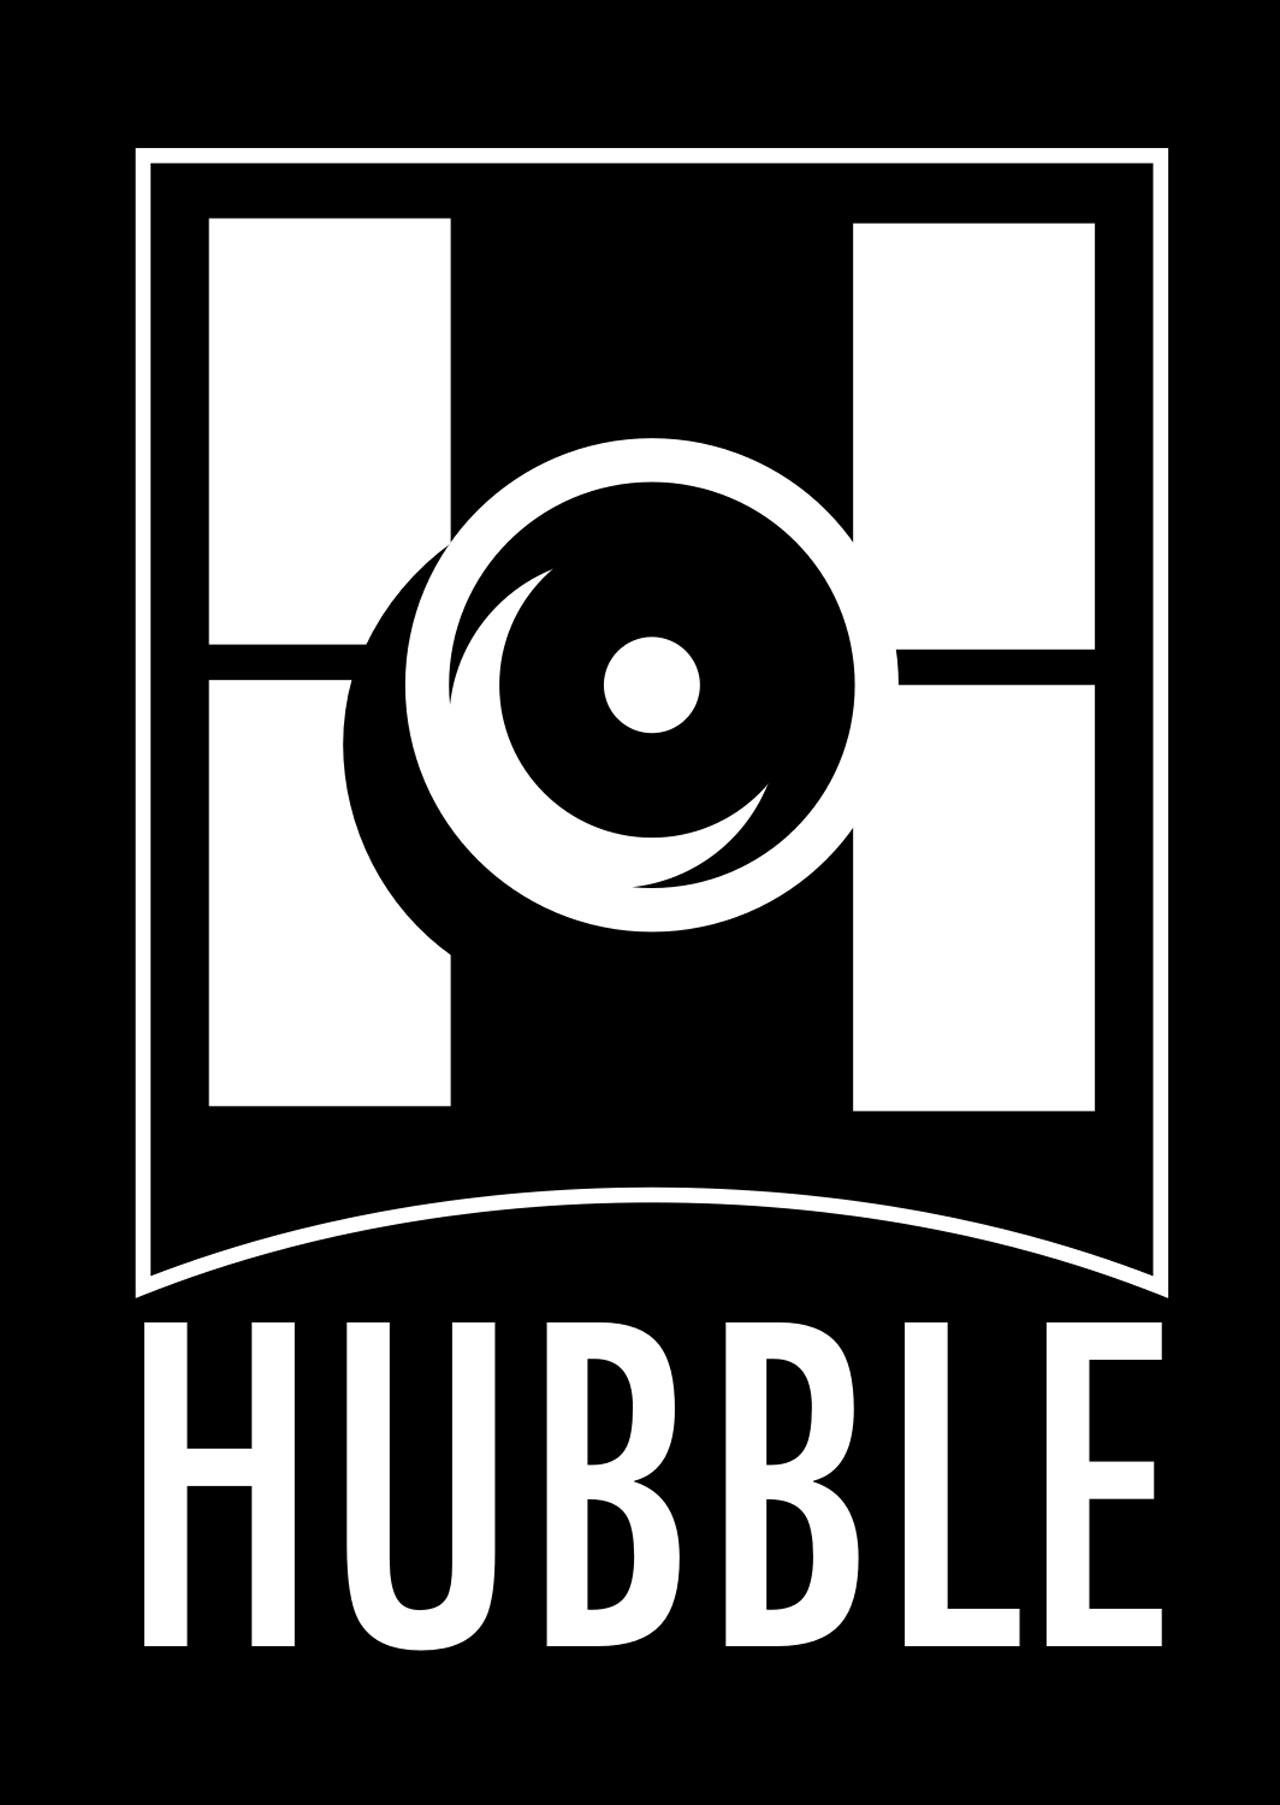 Hubble European Space Agency Information Centre - small | ESA/Hubble